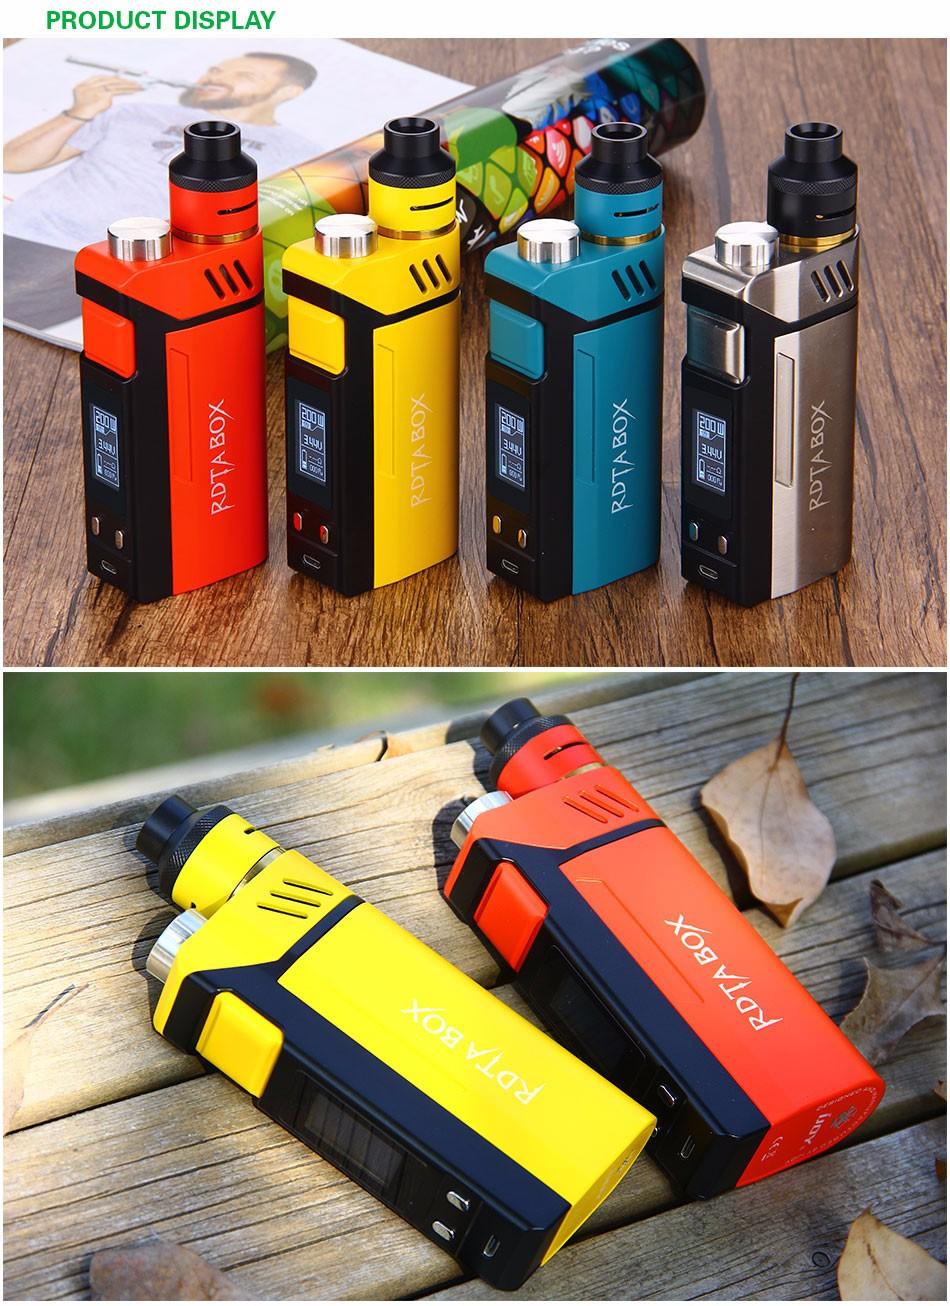 Original IJOY RDTA BOX Mod 0W +12.8ml Large e-juice Tank Atomizer & RDTA BOX MOD & IMC-3/IMC-Coil 3 Coils e-Cigarette 7